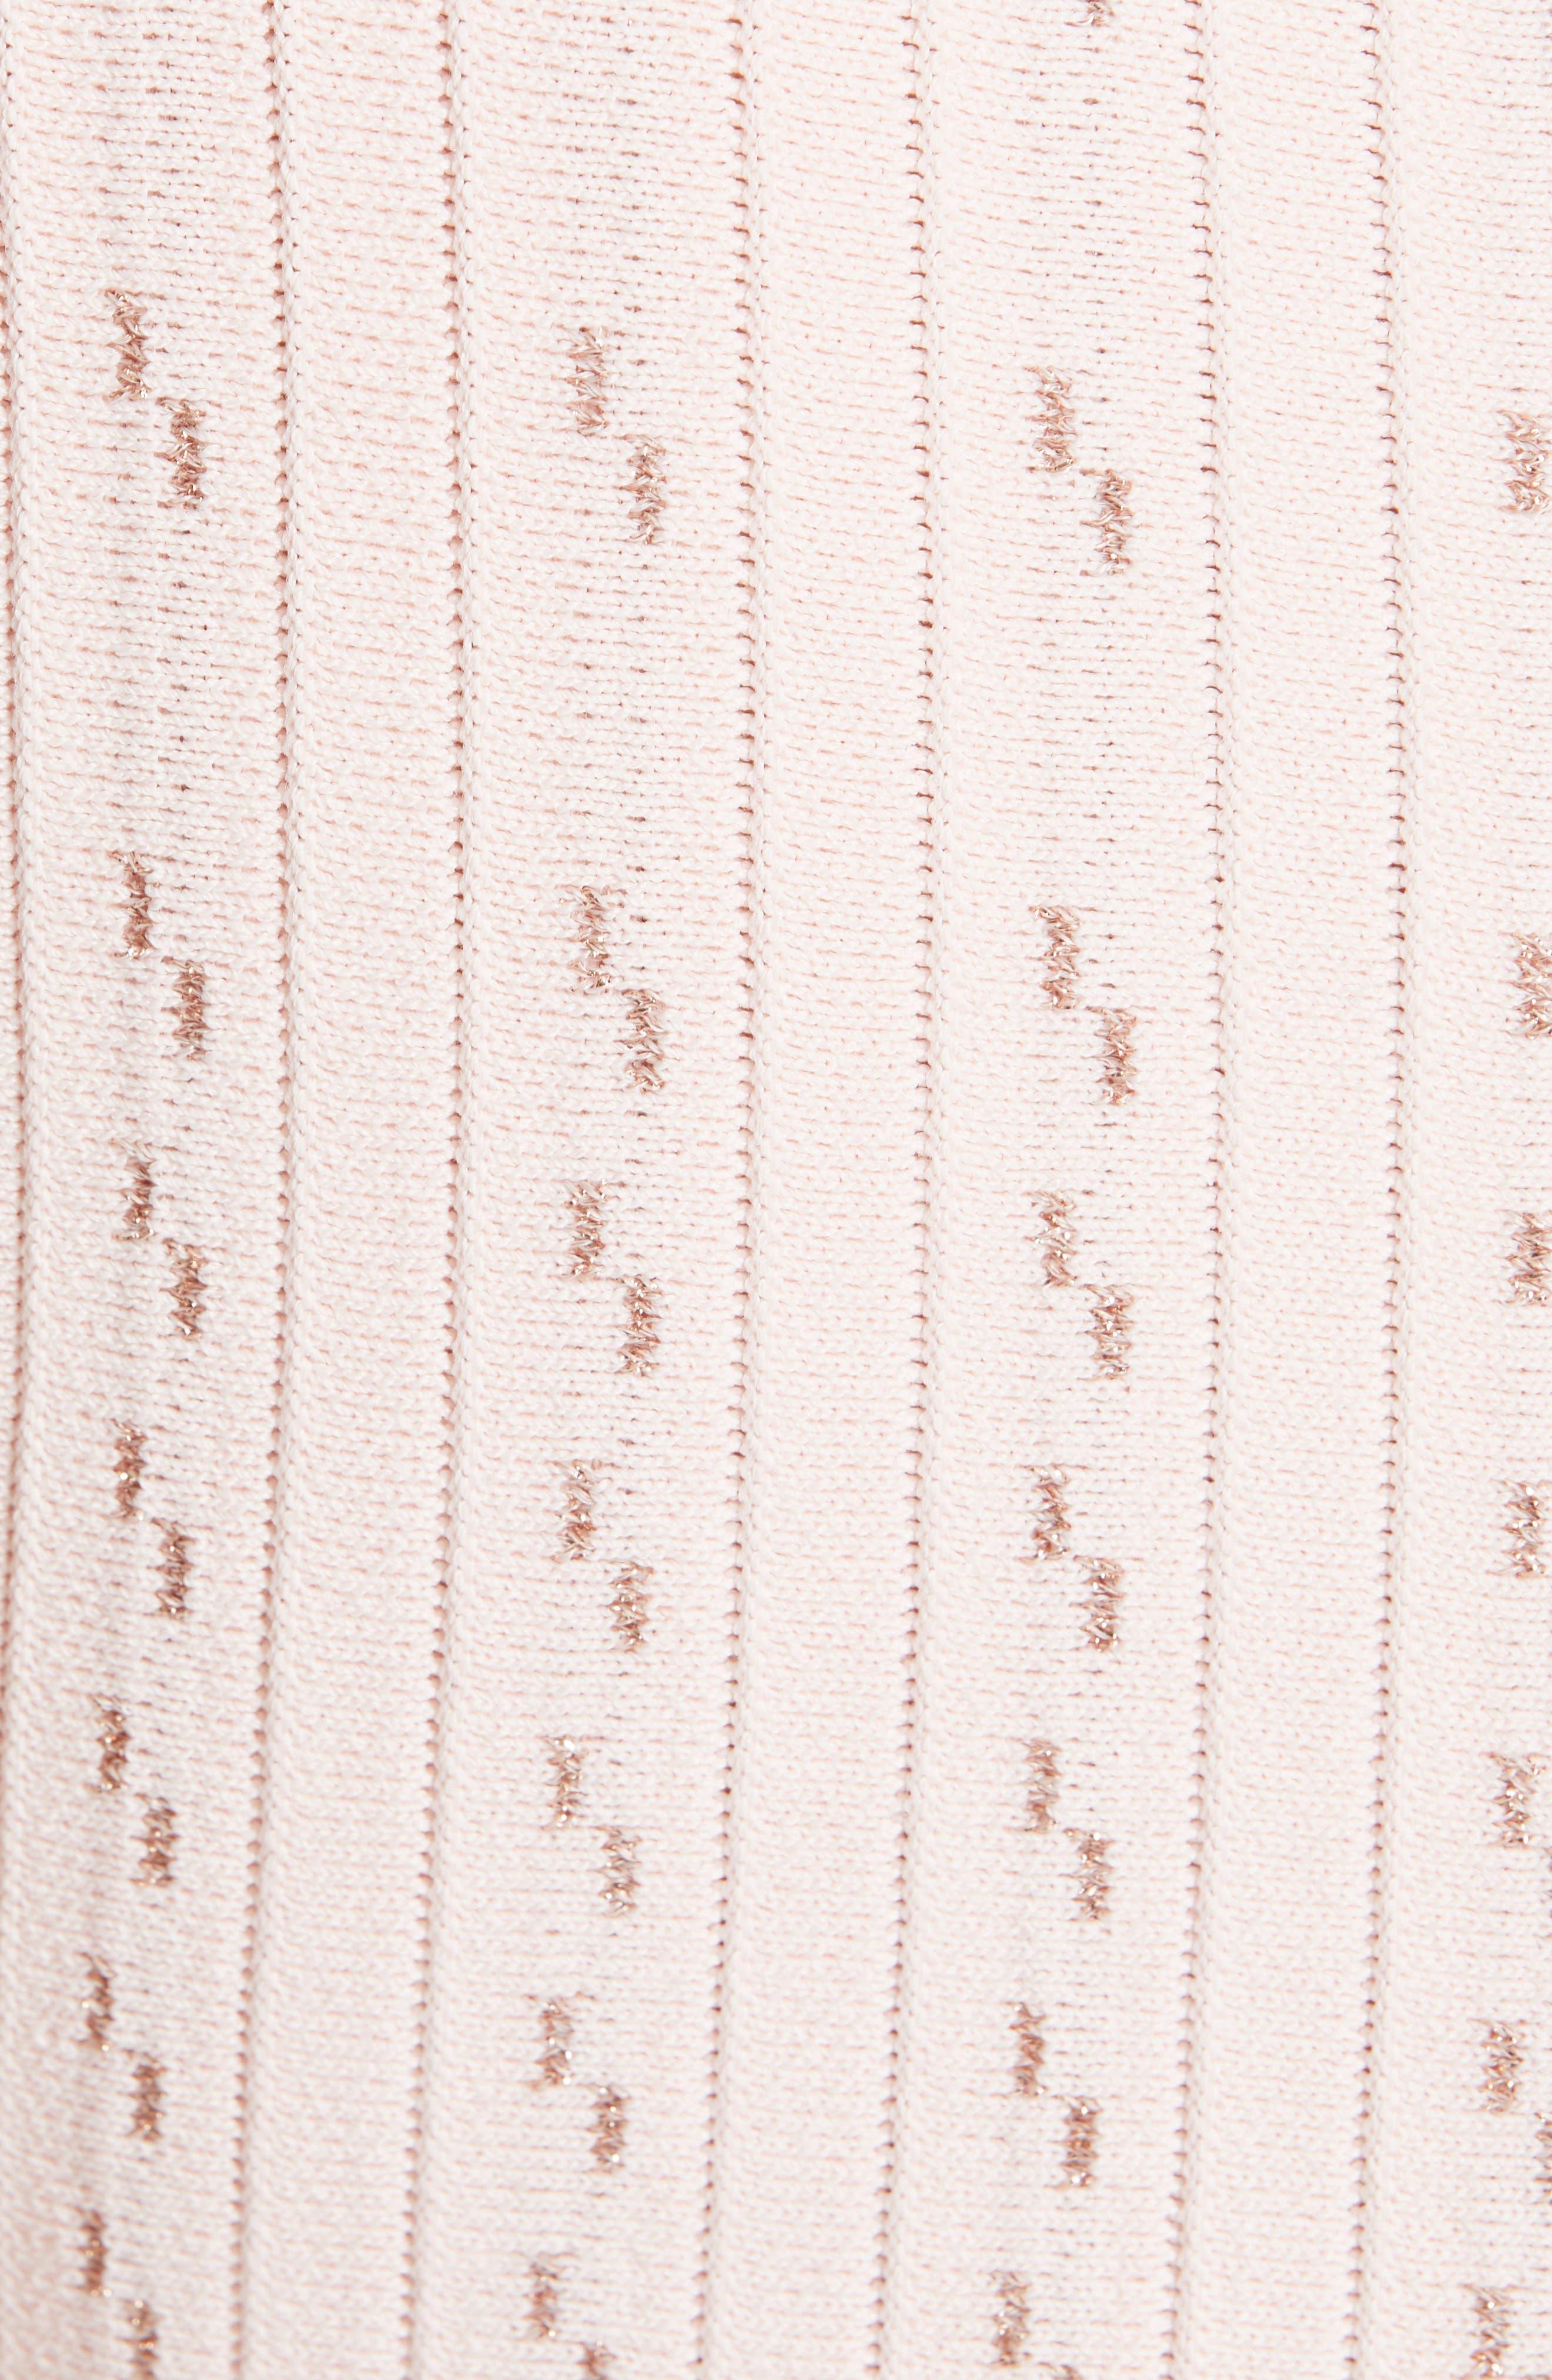 Vellia Flippy Knit Skater Dress,                             Alternate thumbnail 6, color,                             PALE PINK